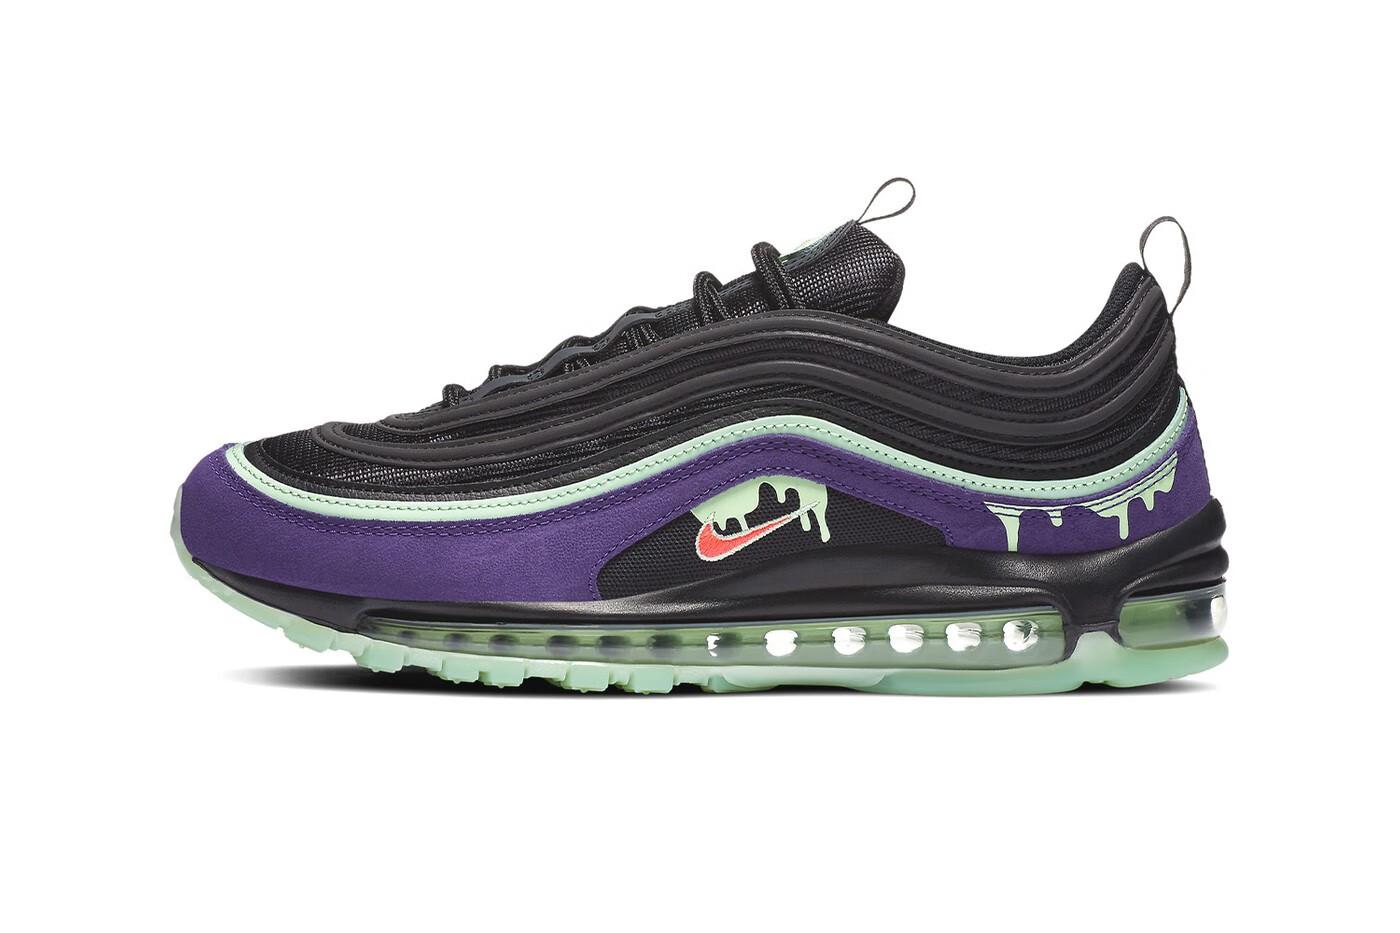 Nike Air Max 97 Oozes Slime采用全新万圣节风格配色